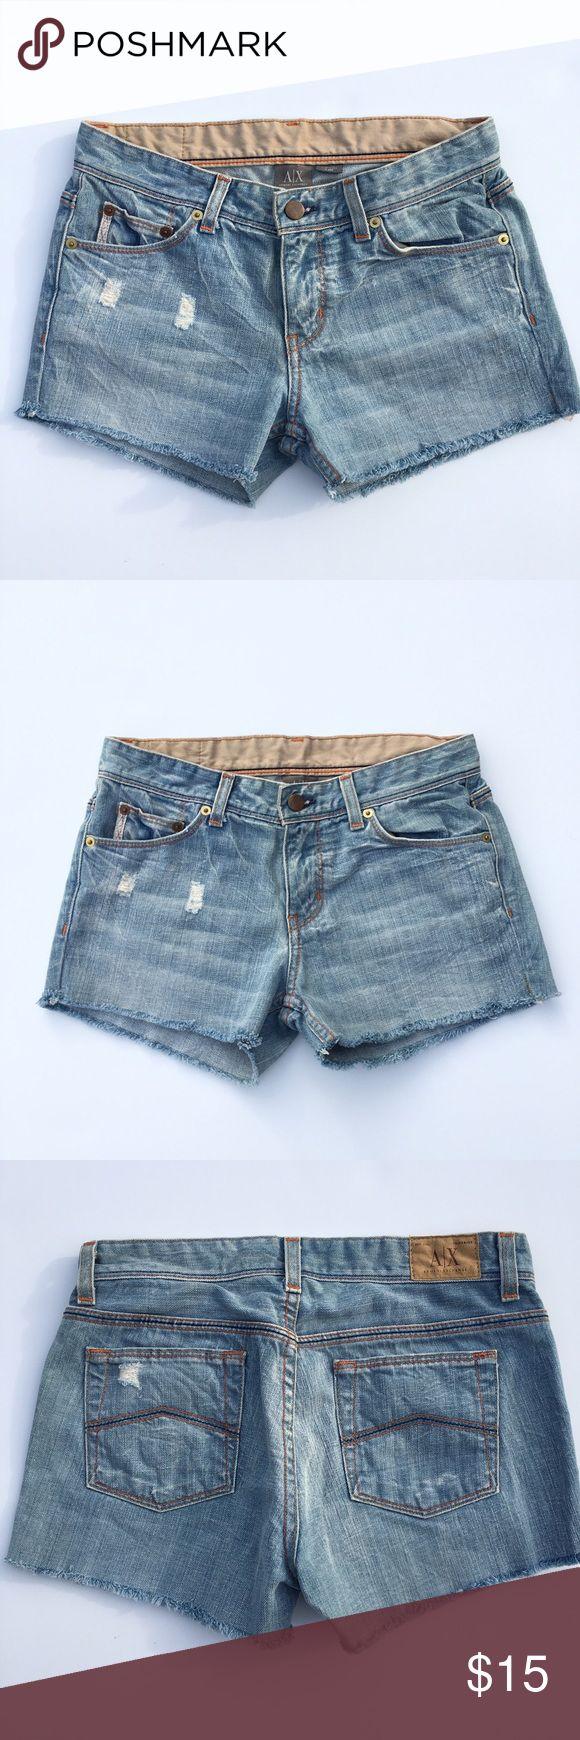 Armani Exchange denim cut off shorts Armani Exchange denim cut off shorts, in great condition! A/X Armani Exchange Shorts Jean Shorts